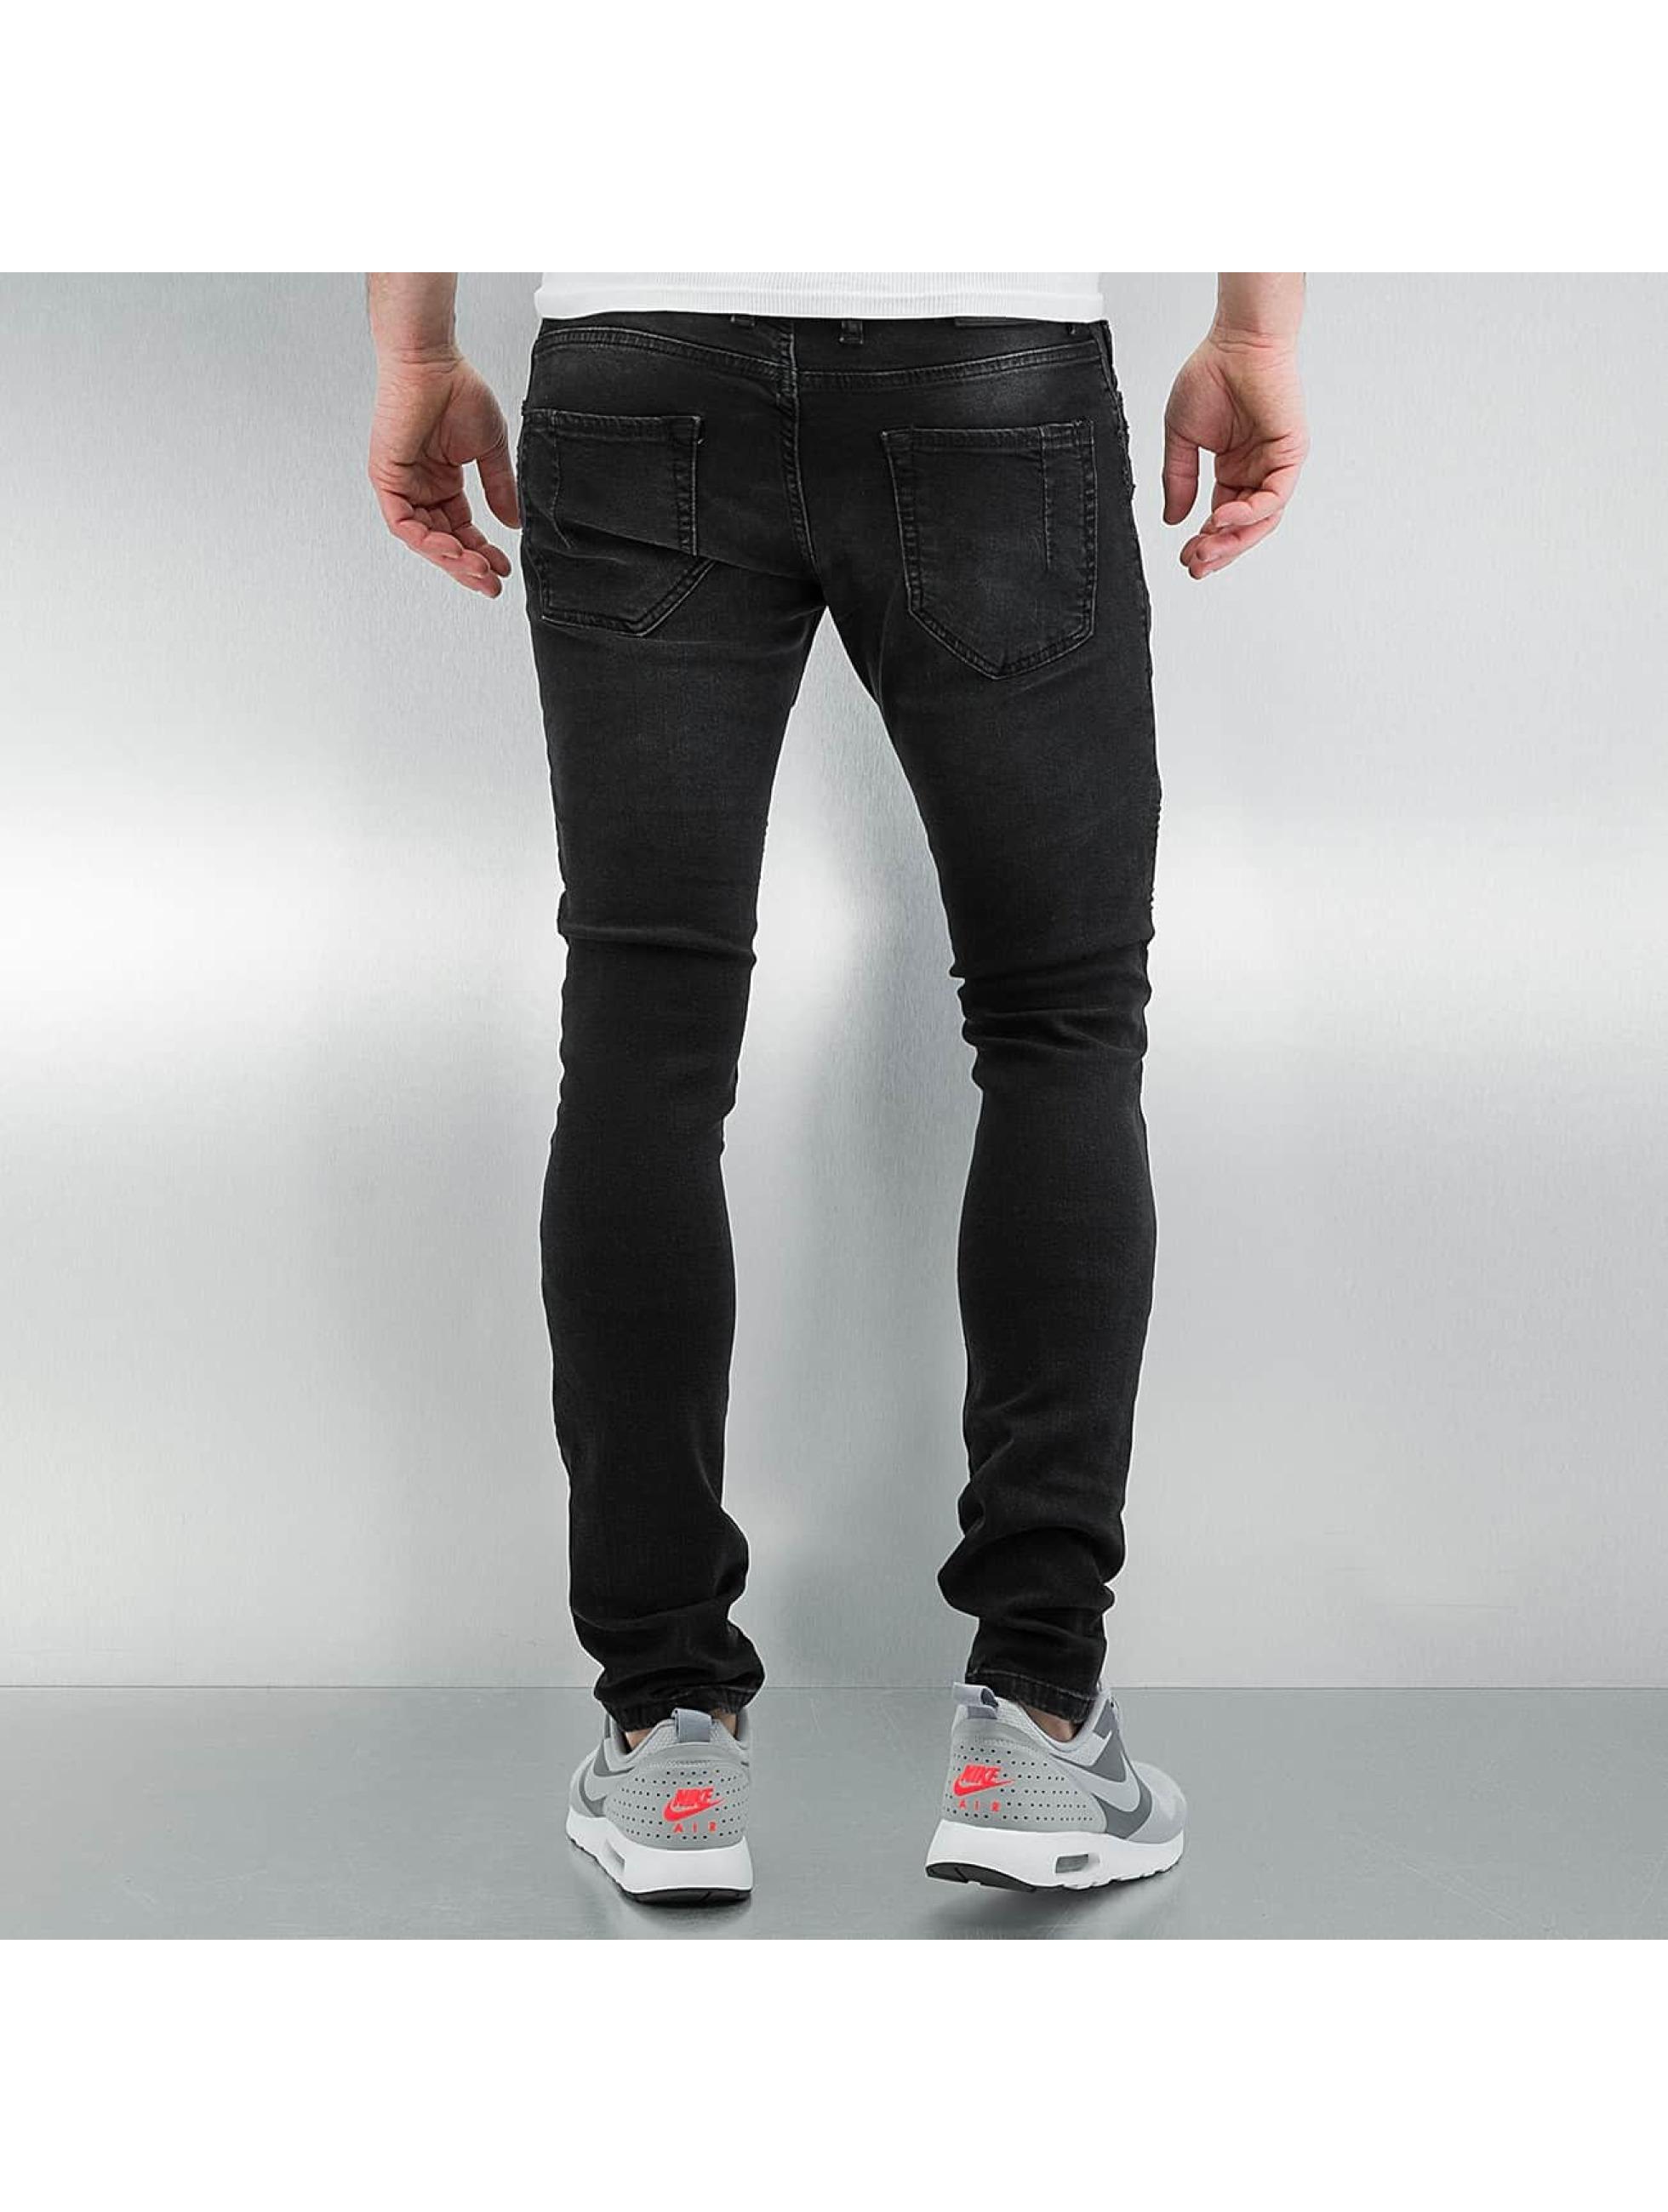 2y sintra noir homme jean skinny 2y acheter pas cher jean 343307. Black Bedroom Furniture Sets. Home Design Ideas